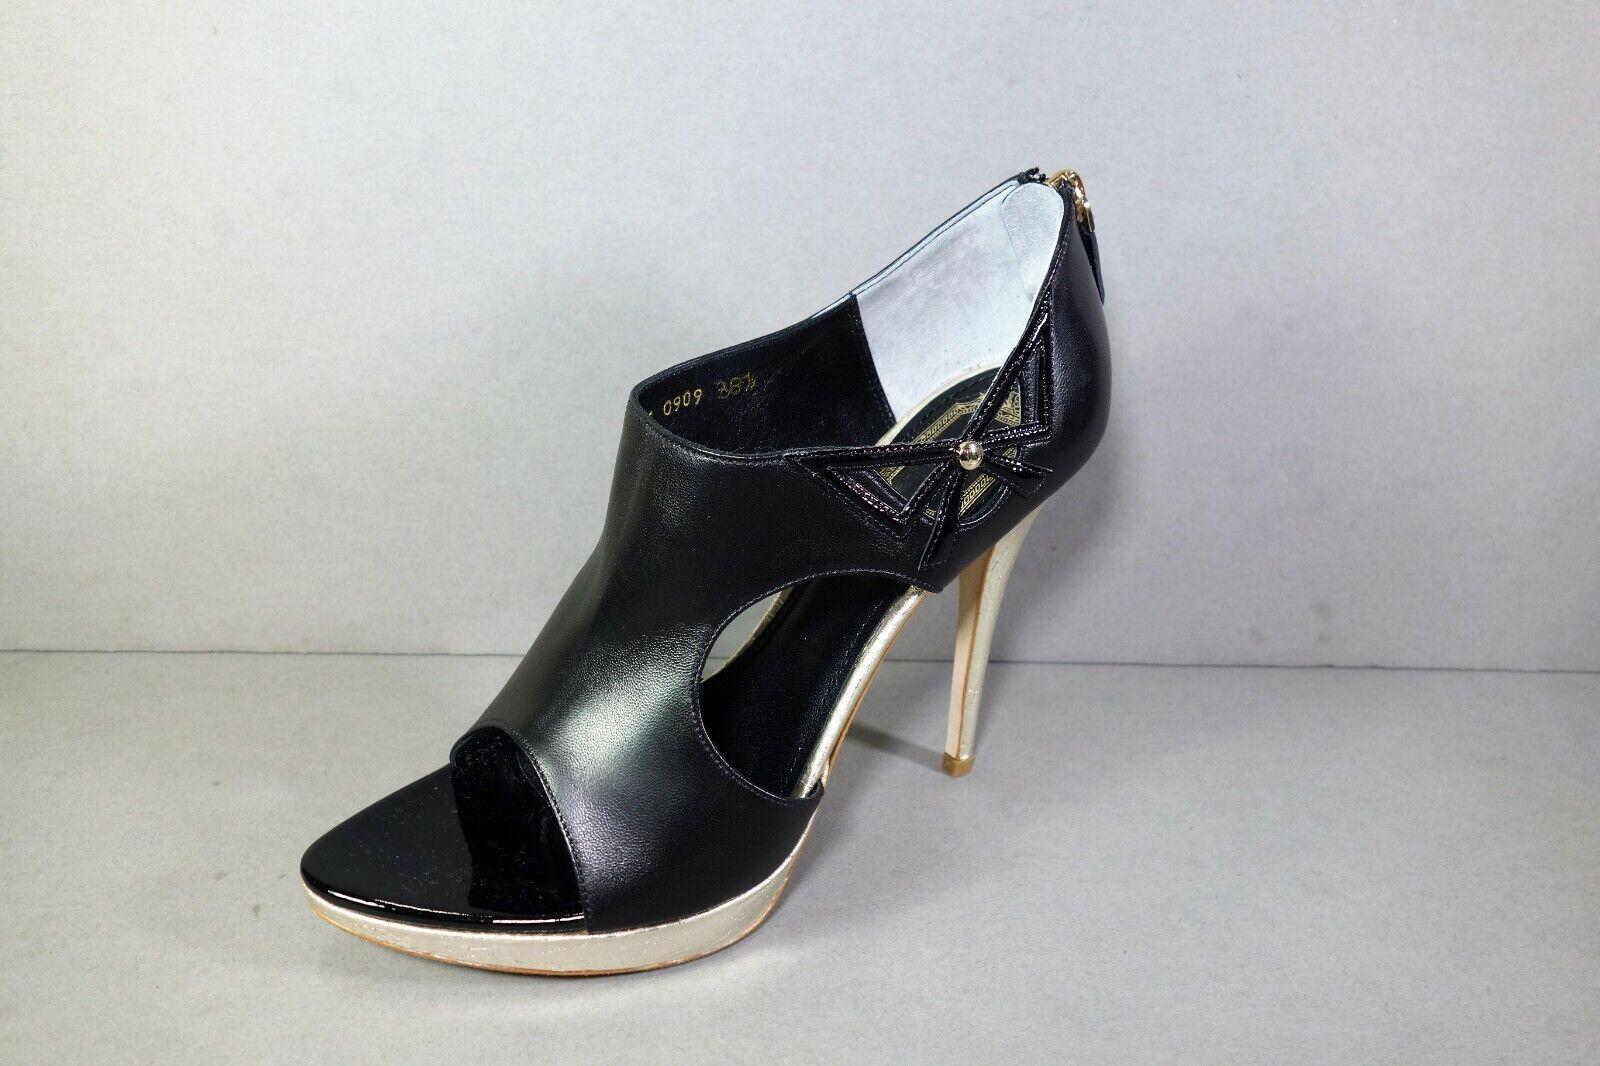 DIOR 38.5 Black Black Black Leather LOLITA Peep Toe gold Platform Sandals Pumps Booties NEW cbc41b